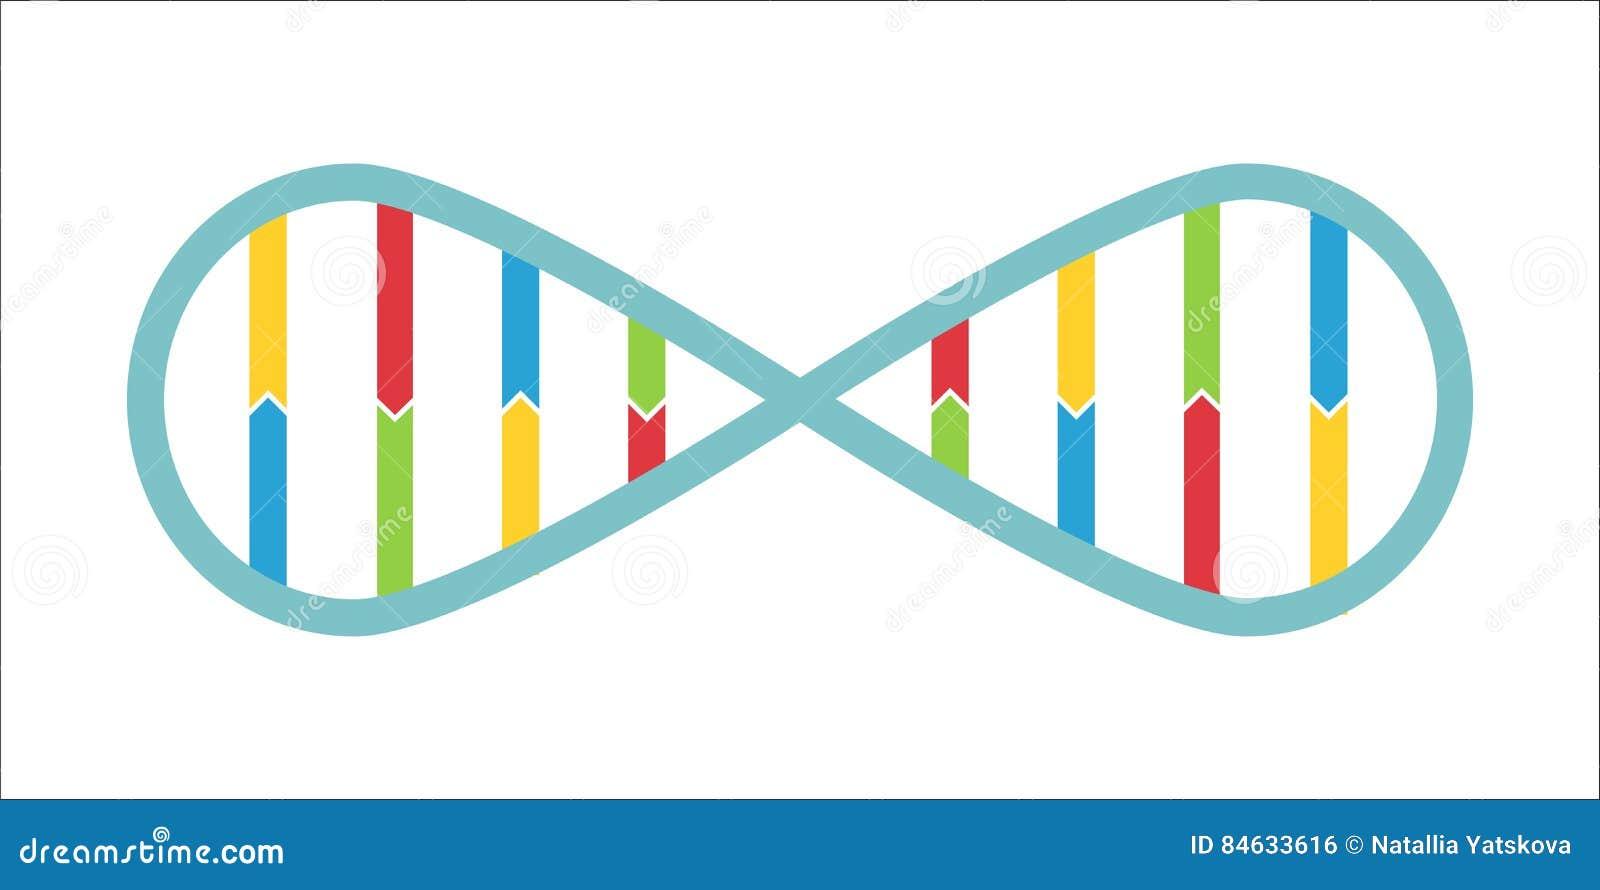 Dna spiral in infinity symbol stock vector illustration 84633616 dna spiral in infinity symbol buycottarizona